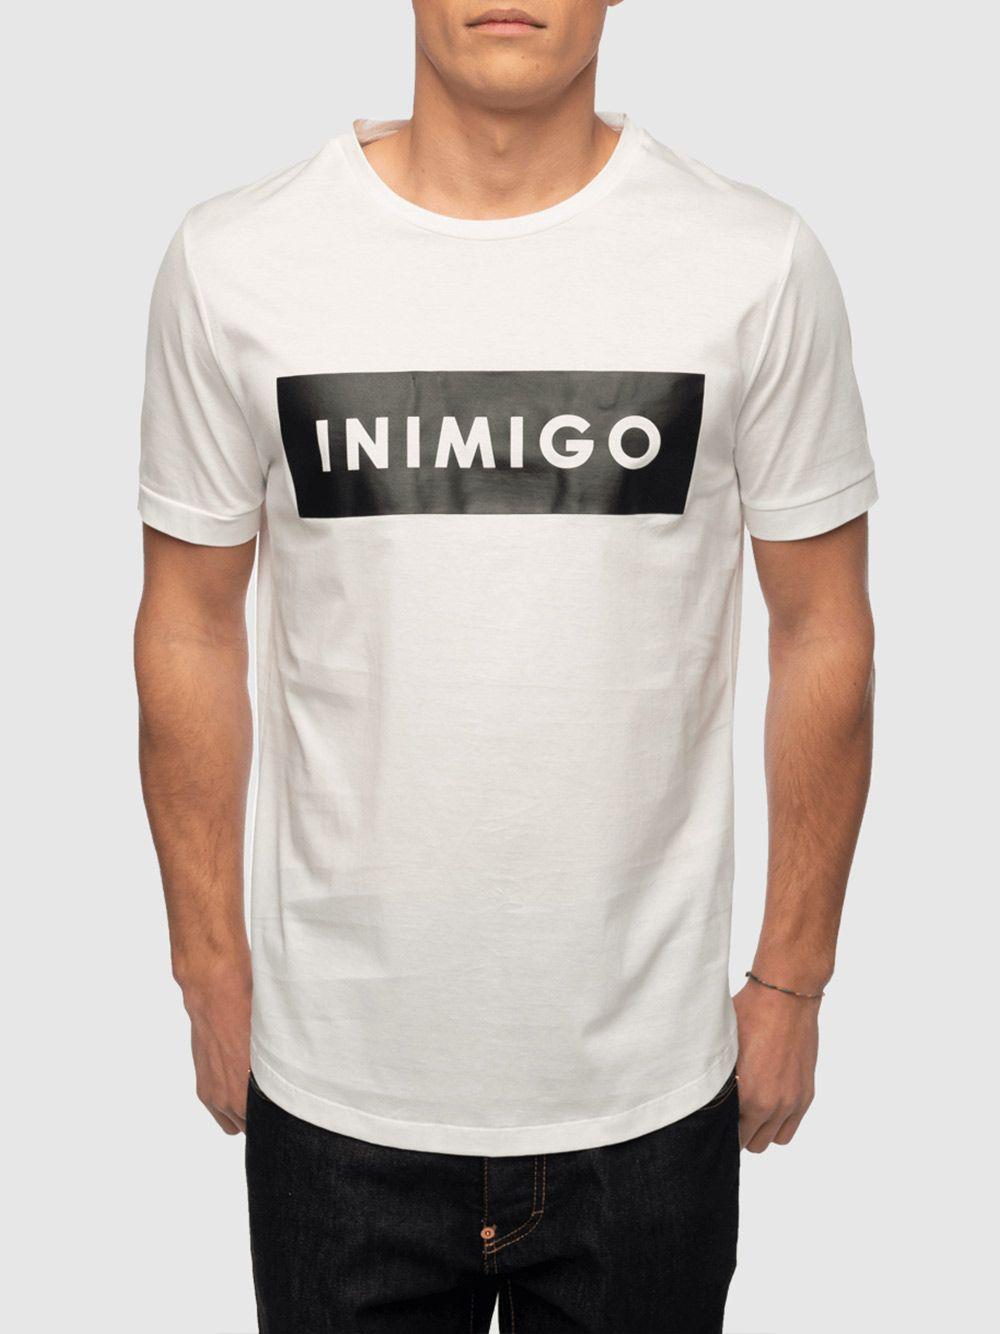 Inimigo Block T-Shirt | Inimigo